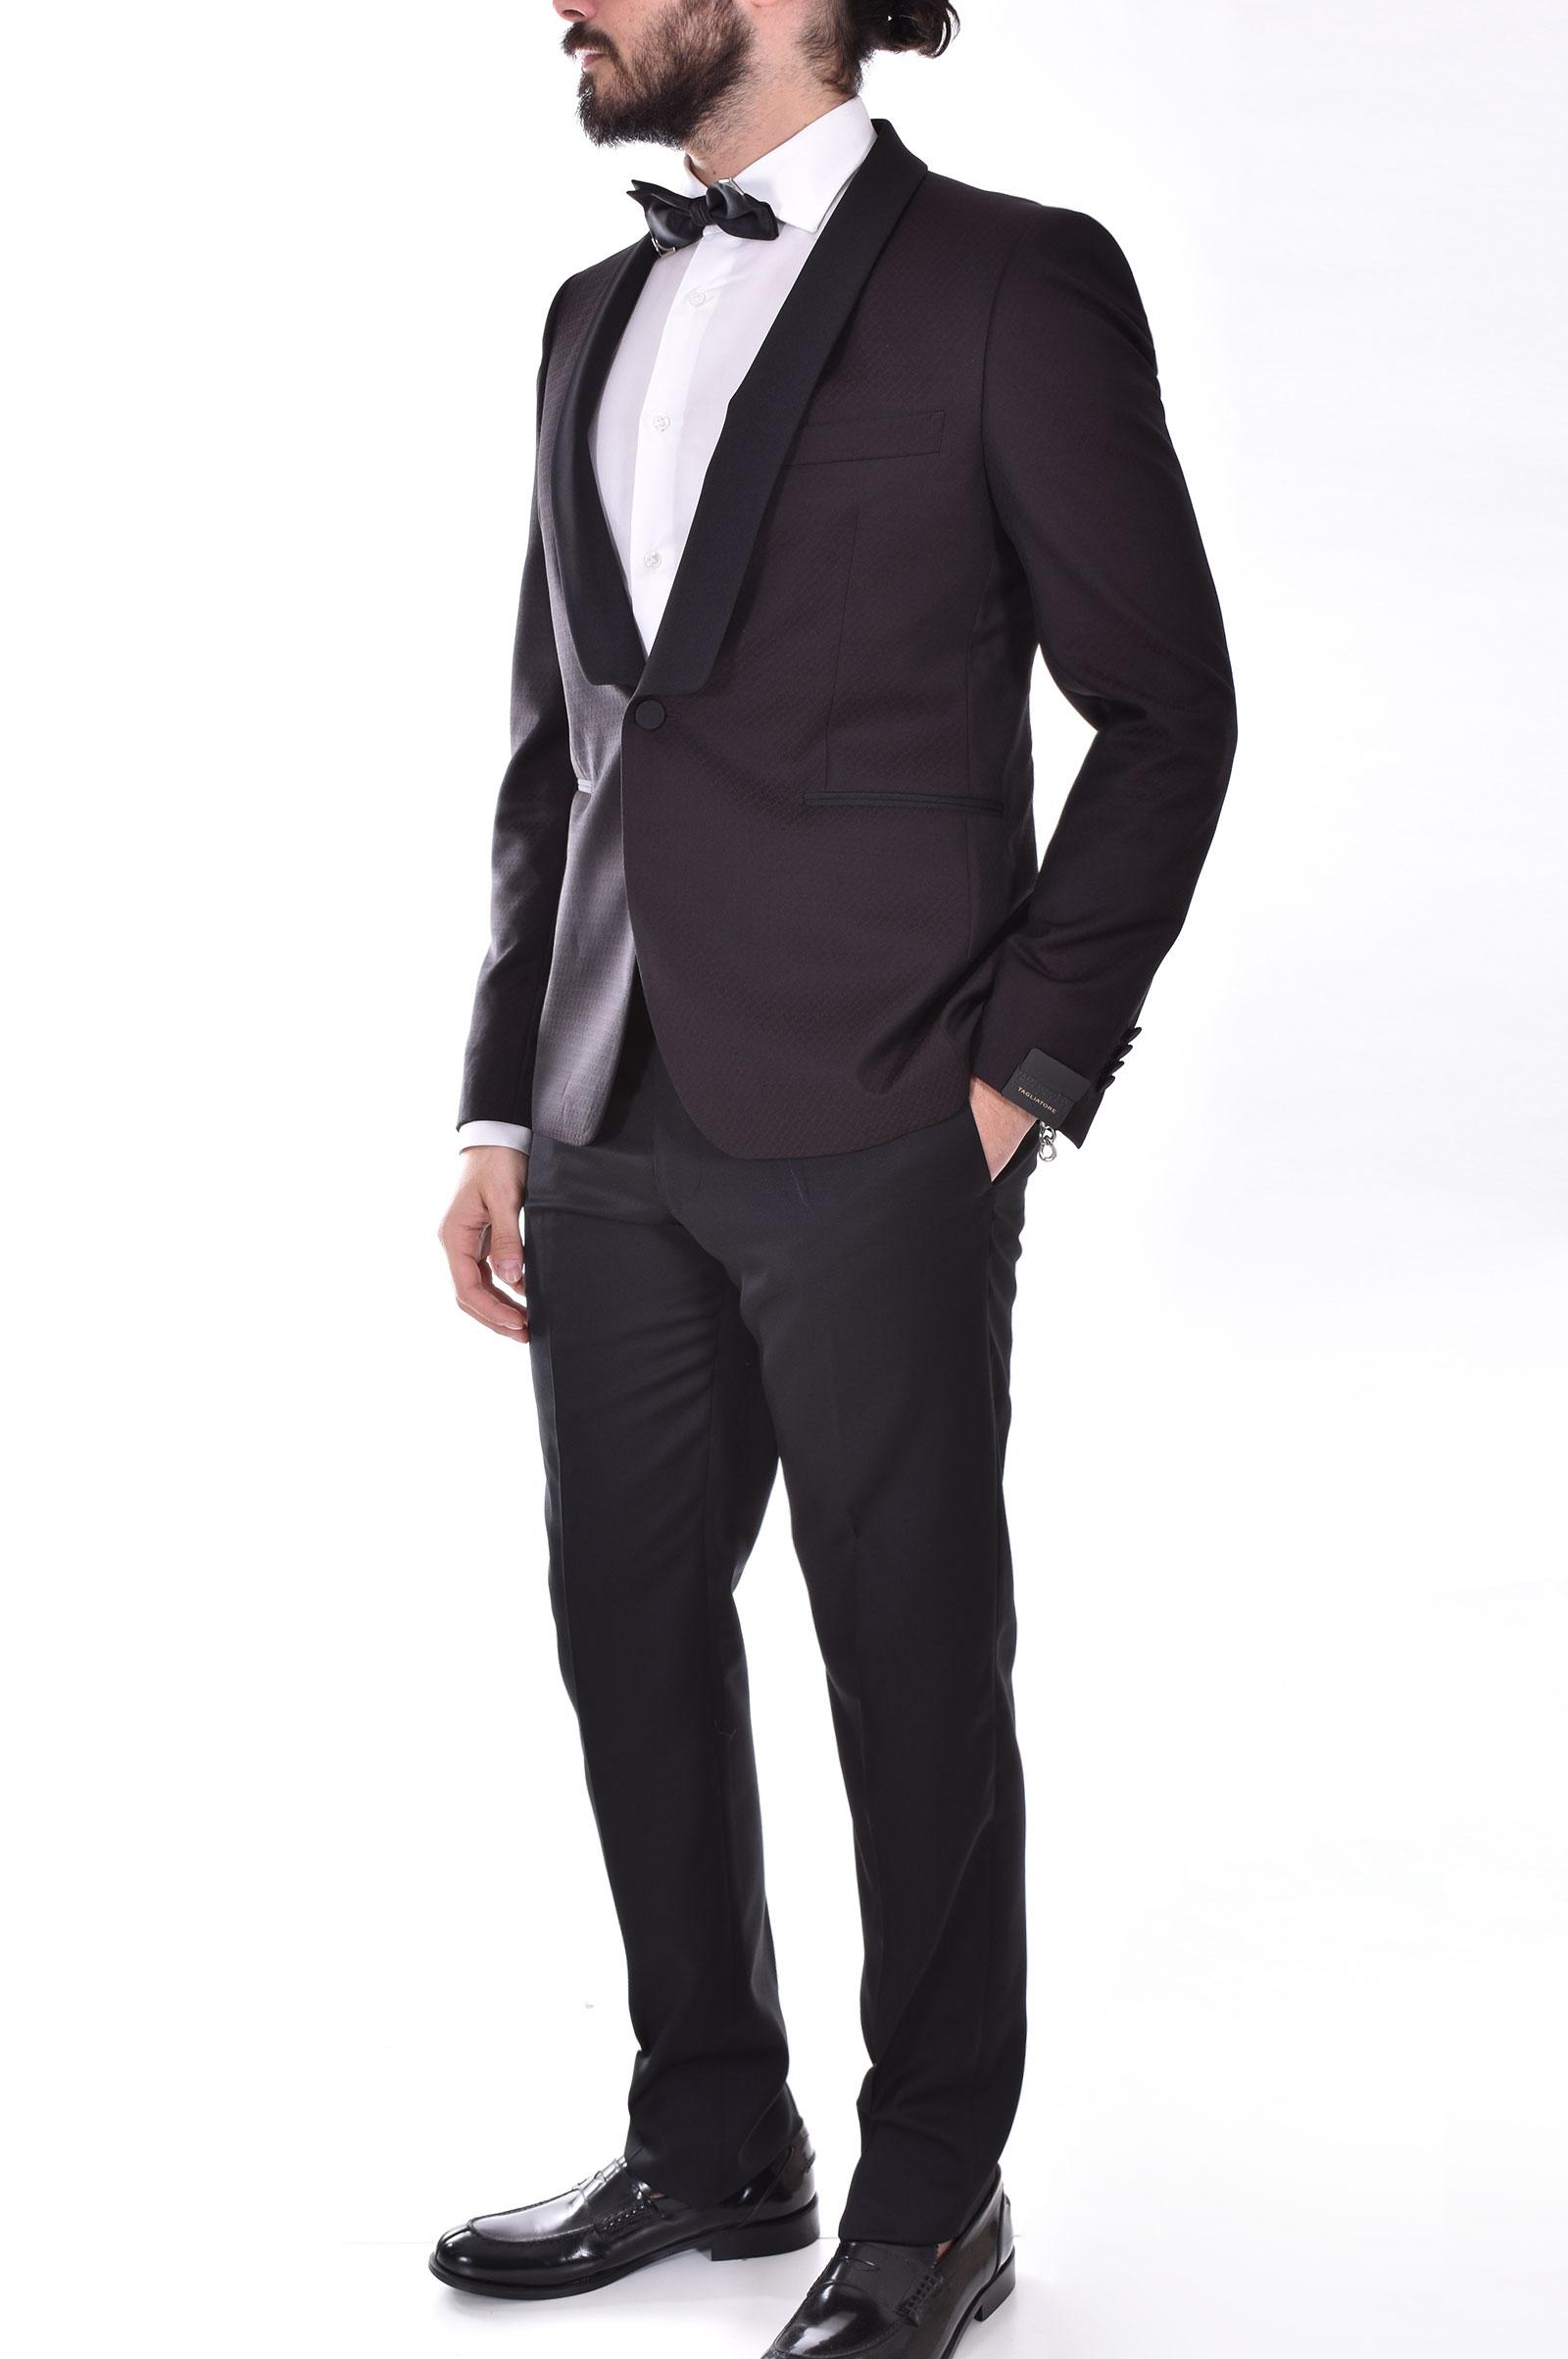 Tagliatore burgundy tuxedo suit TAGLIATORE   06UEZ297/KFSPC1165